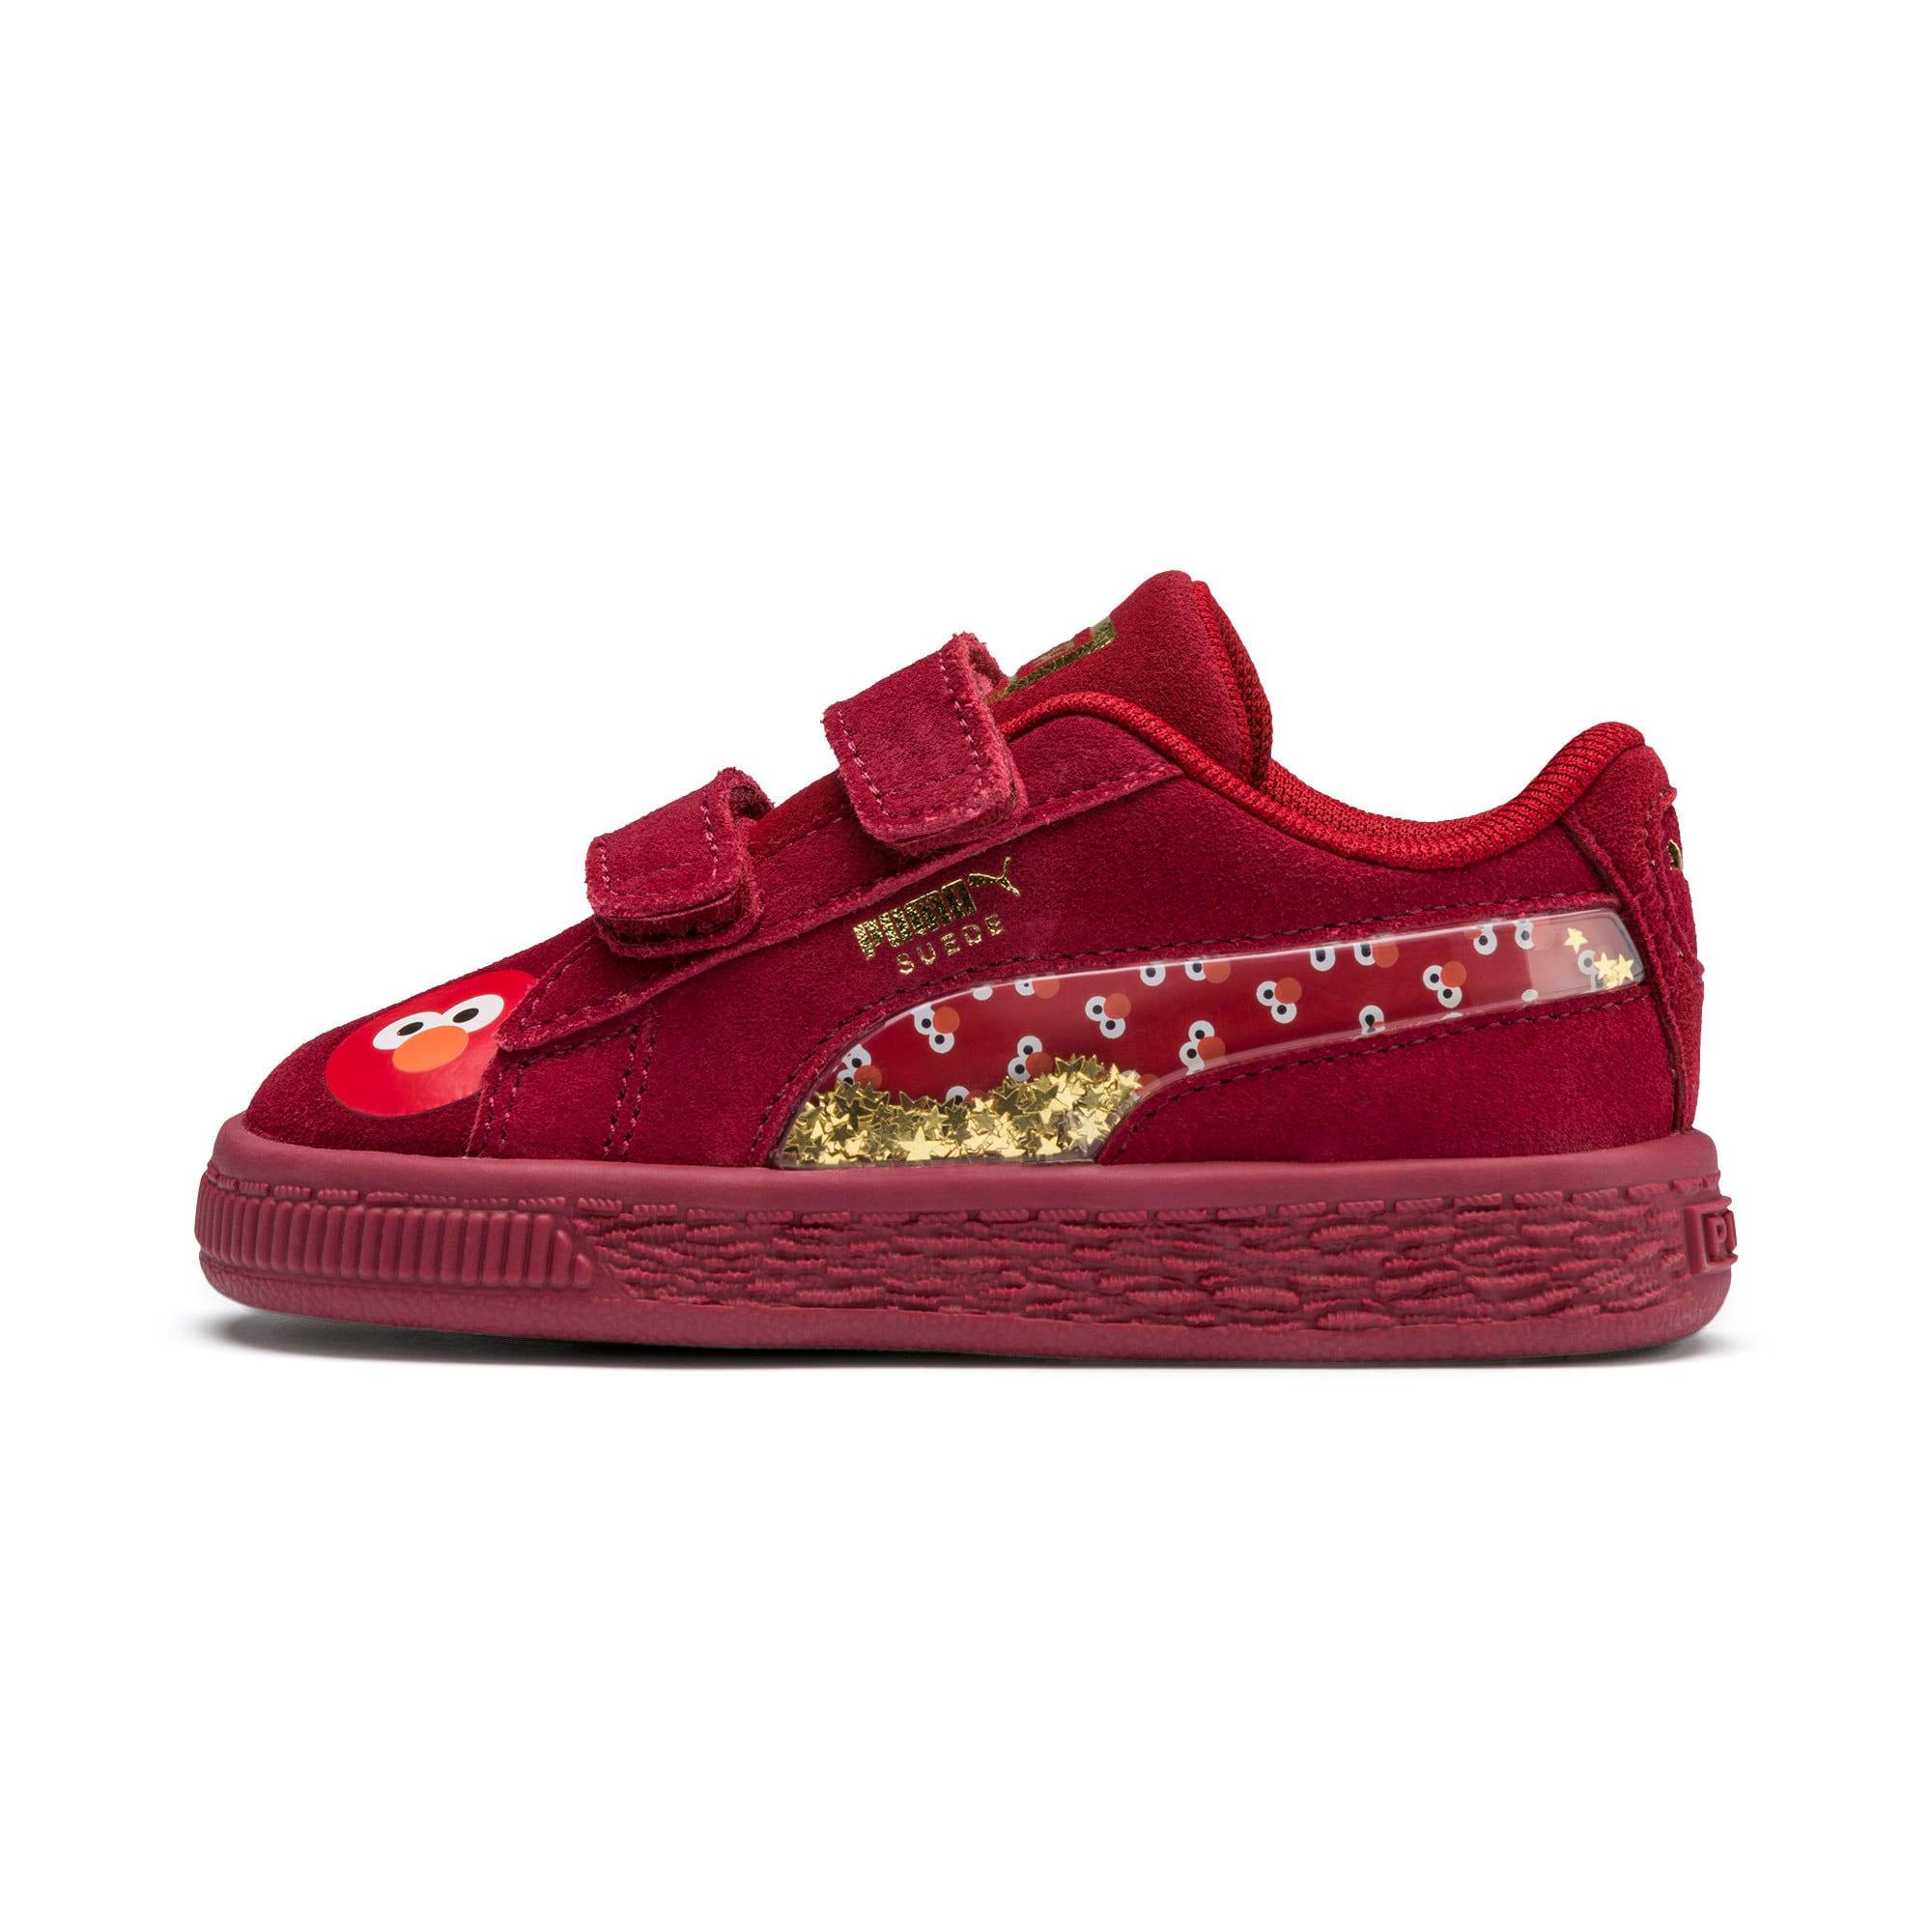 Thumbnail 1 of PUMA x SESAME STREET 50 Suede Statement Toddler Shoes, Rhubarb-Puma White, medium